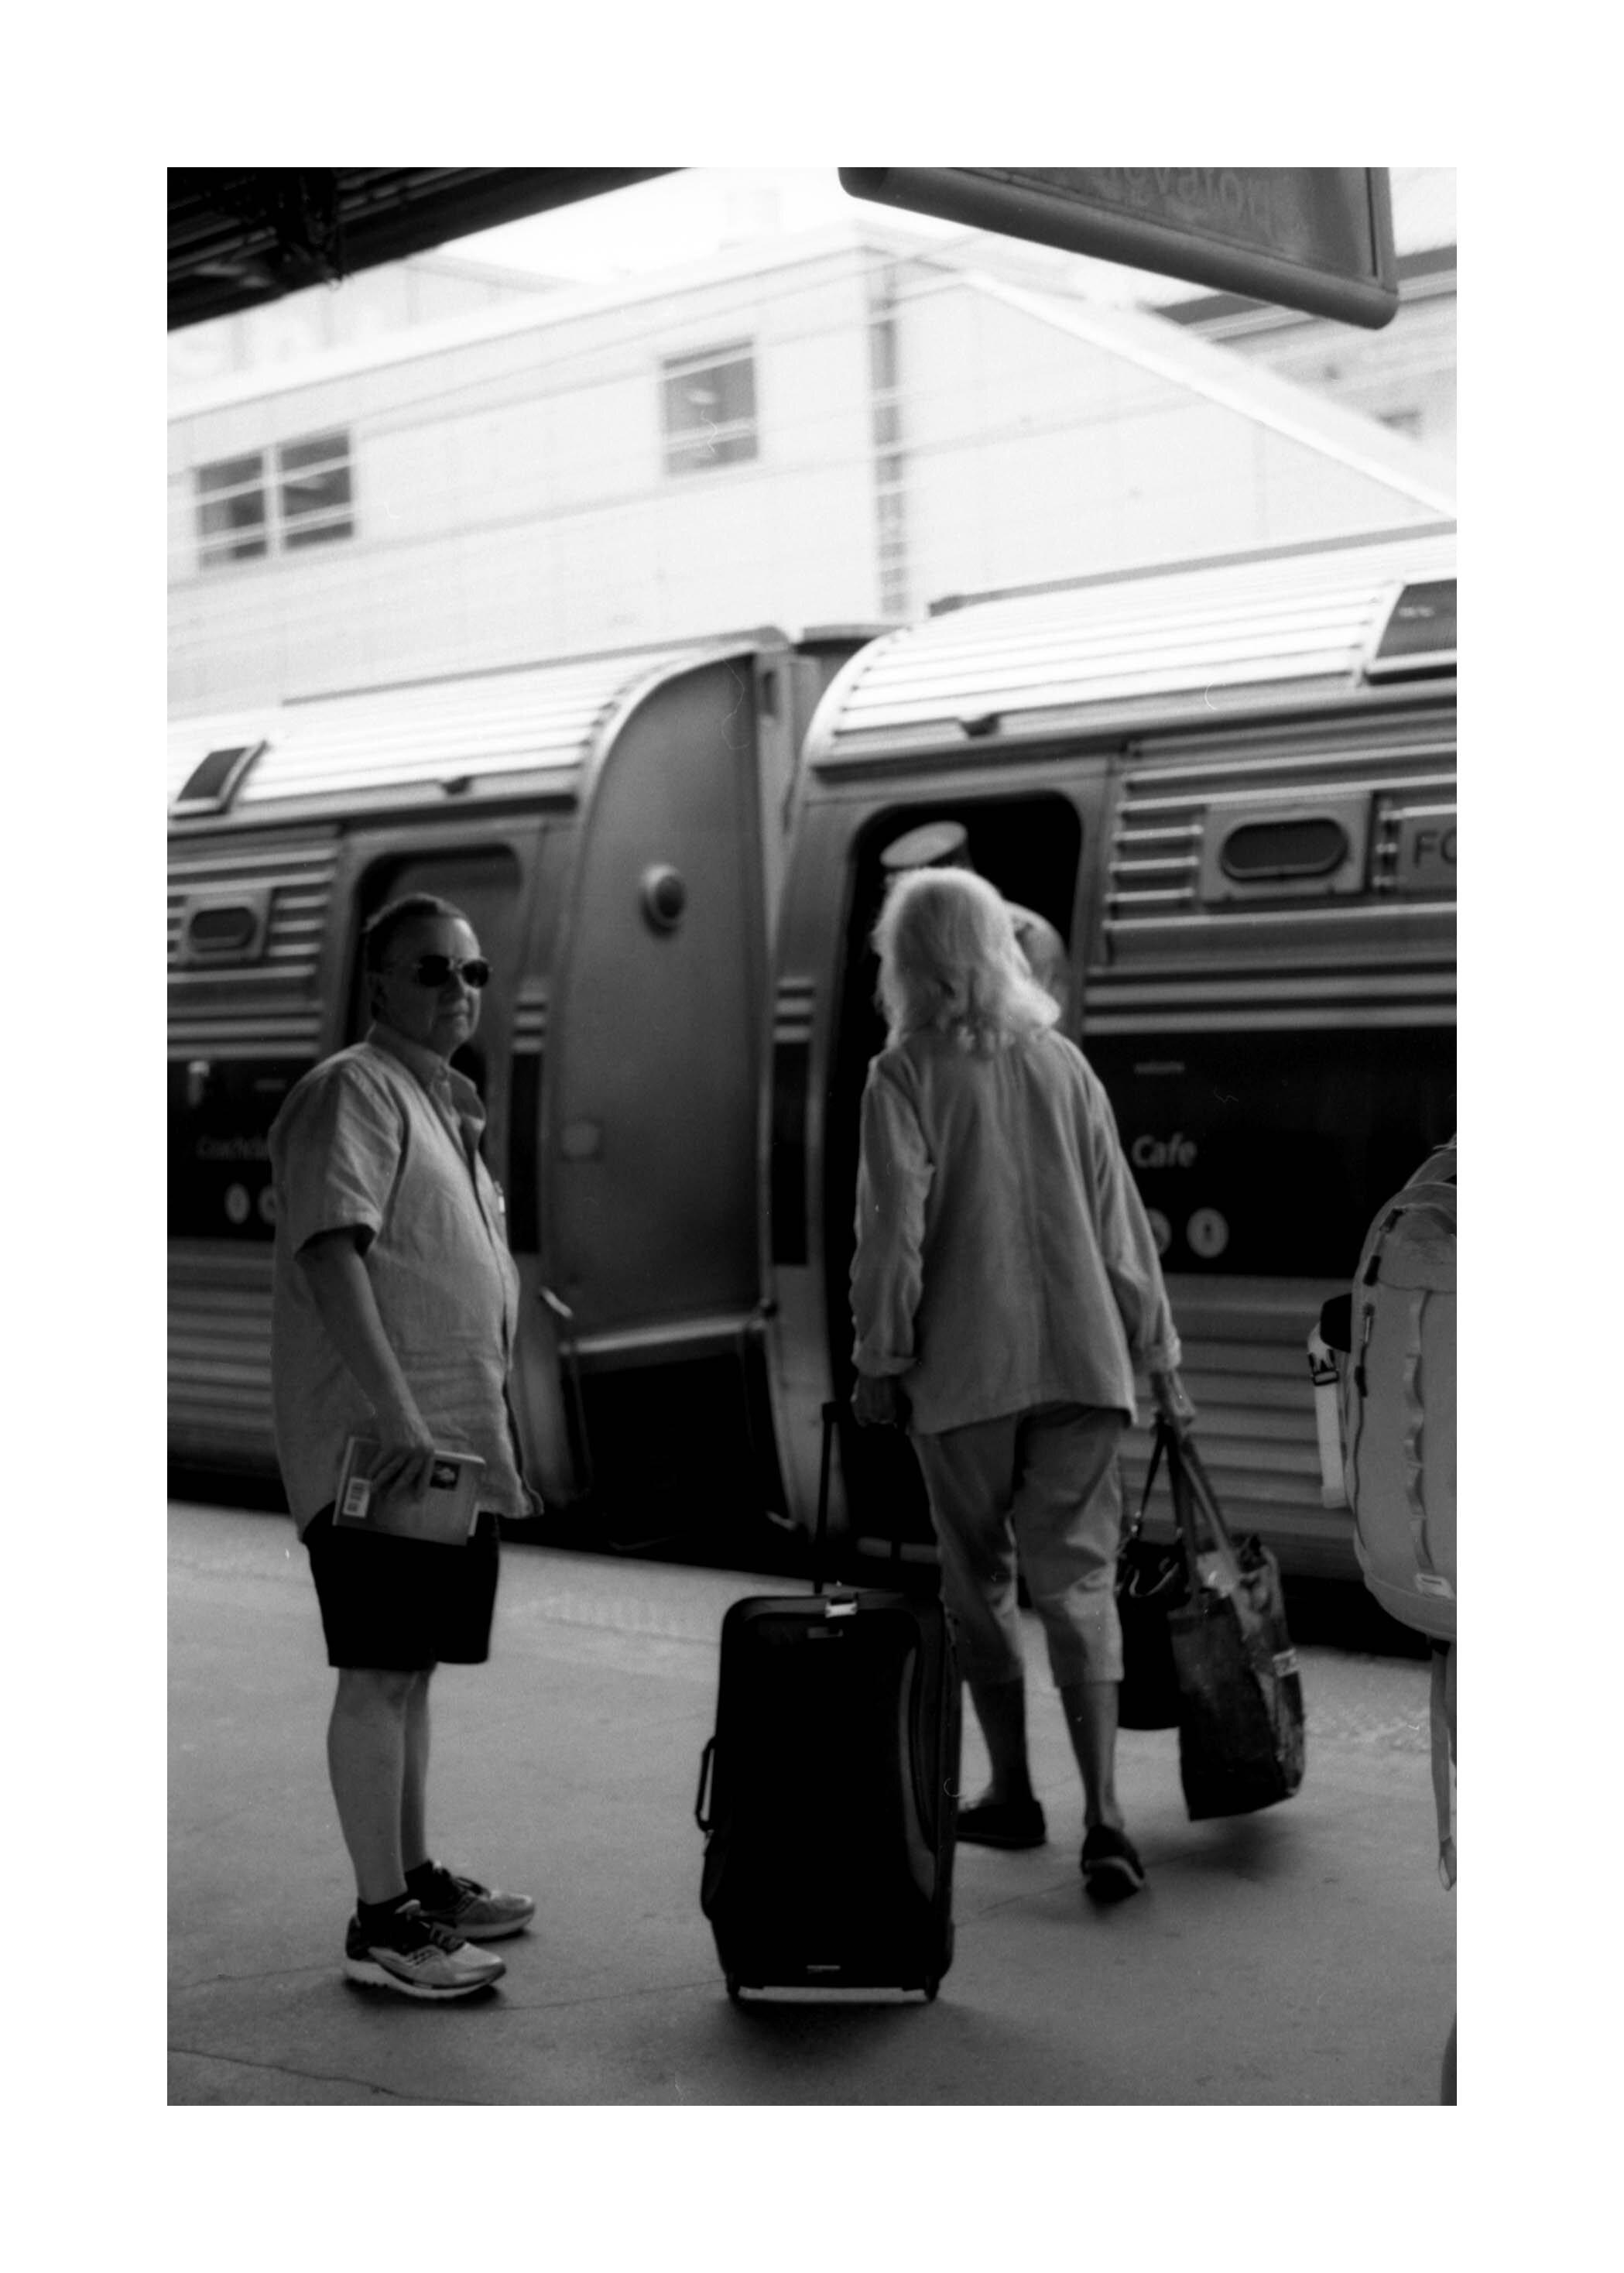 train275edit.jpg